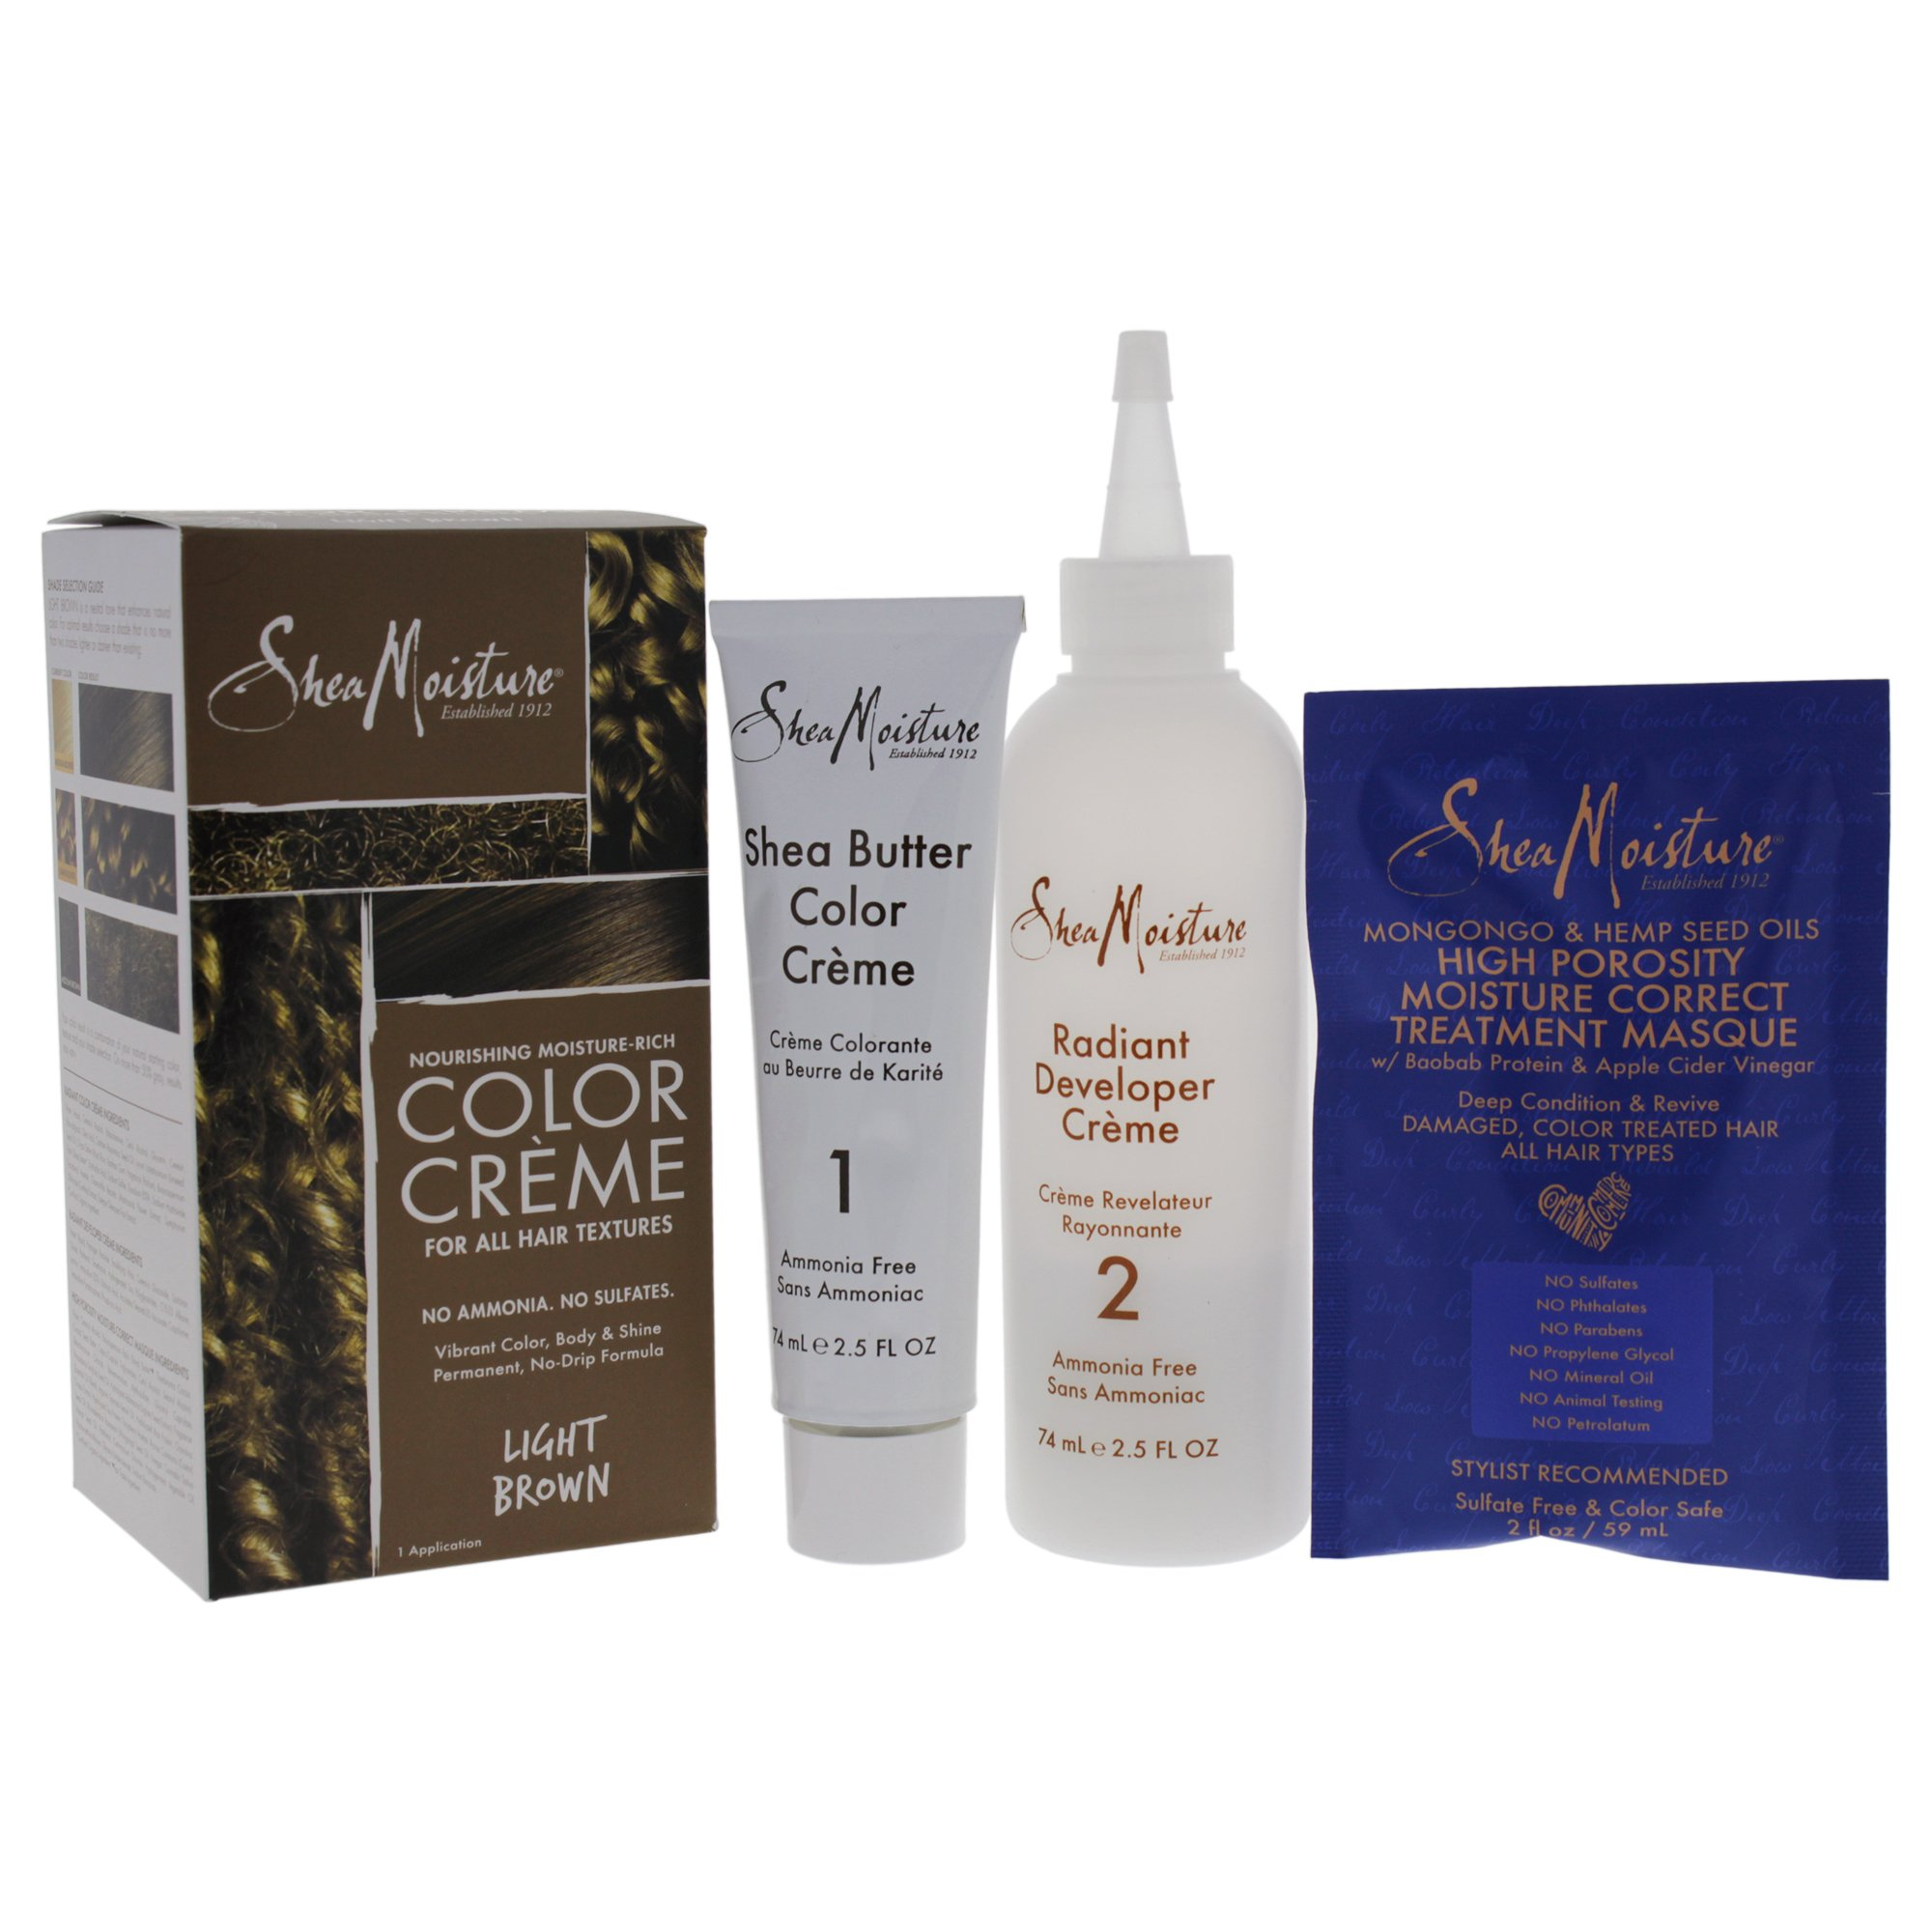 Amazon Shea Moisture Sulfate Free Permanent Hair Dye With No